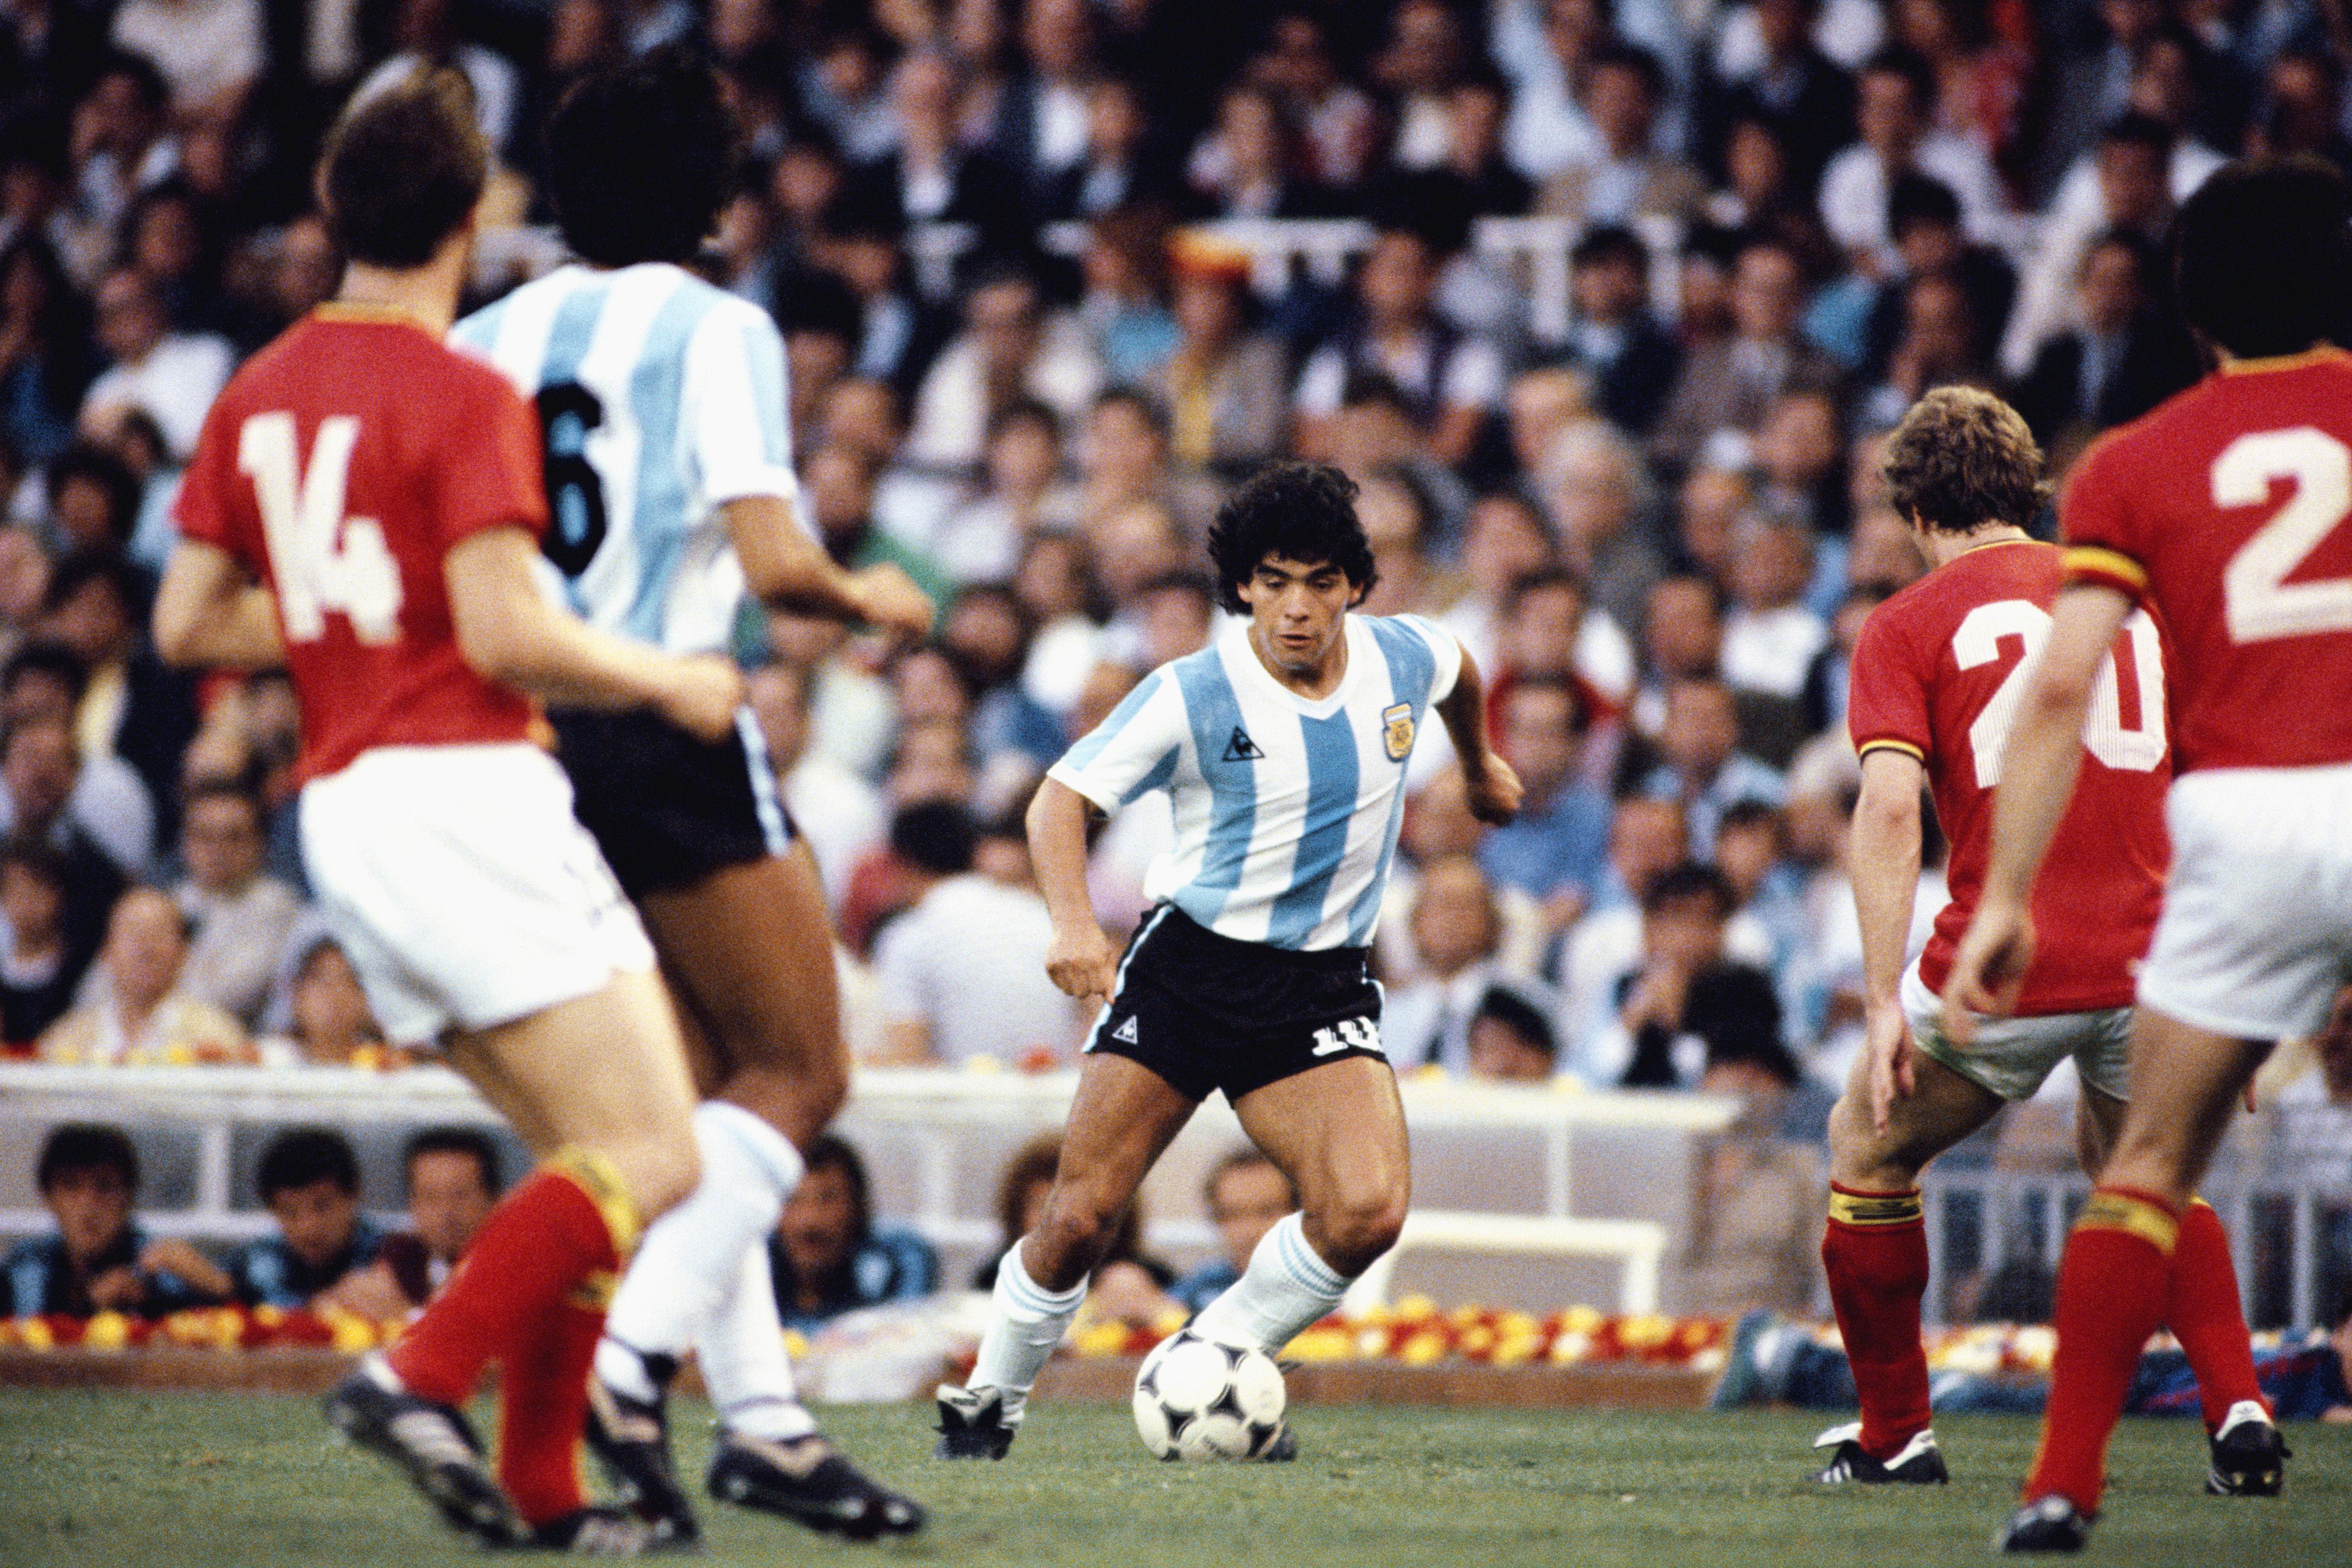 Символ футбола. ФОТО галерея памяти Диего Марадоны - фото 37